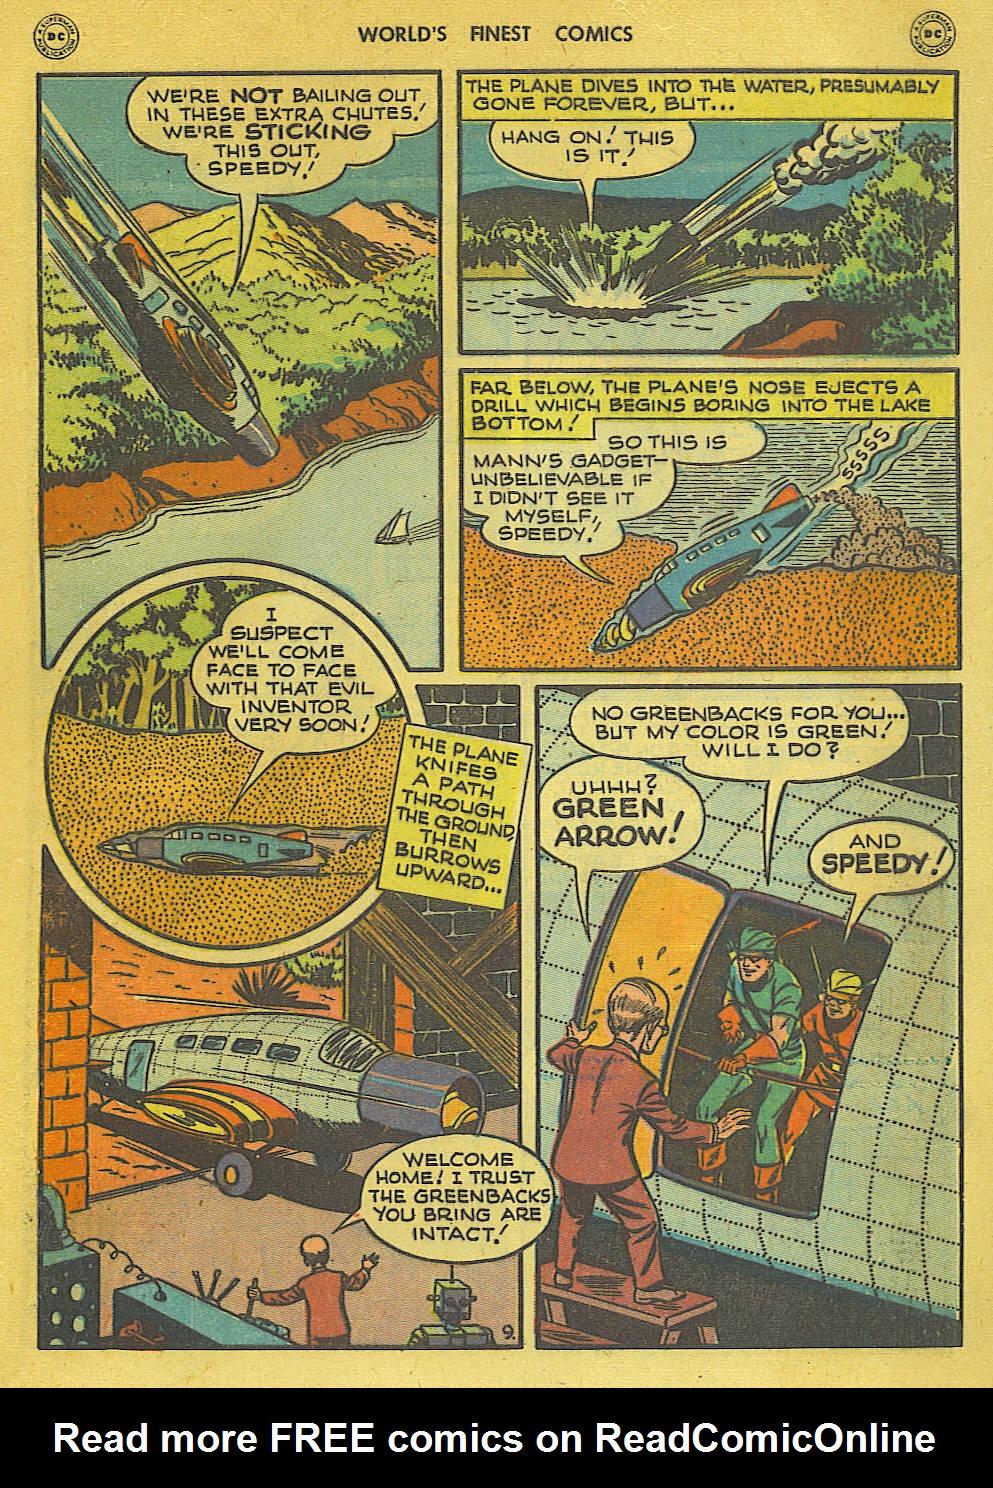 Read online World's Finest Comics comic -  Issue #34 - 49